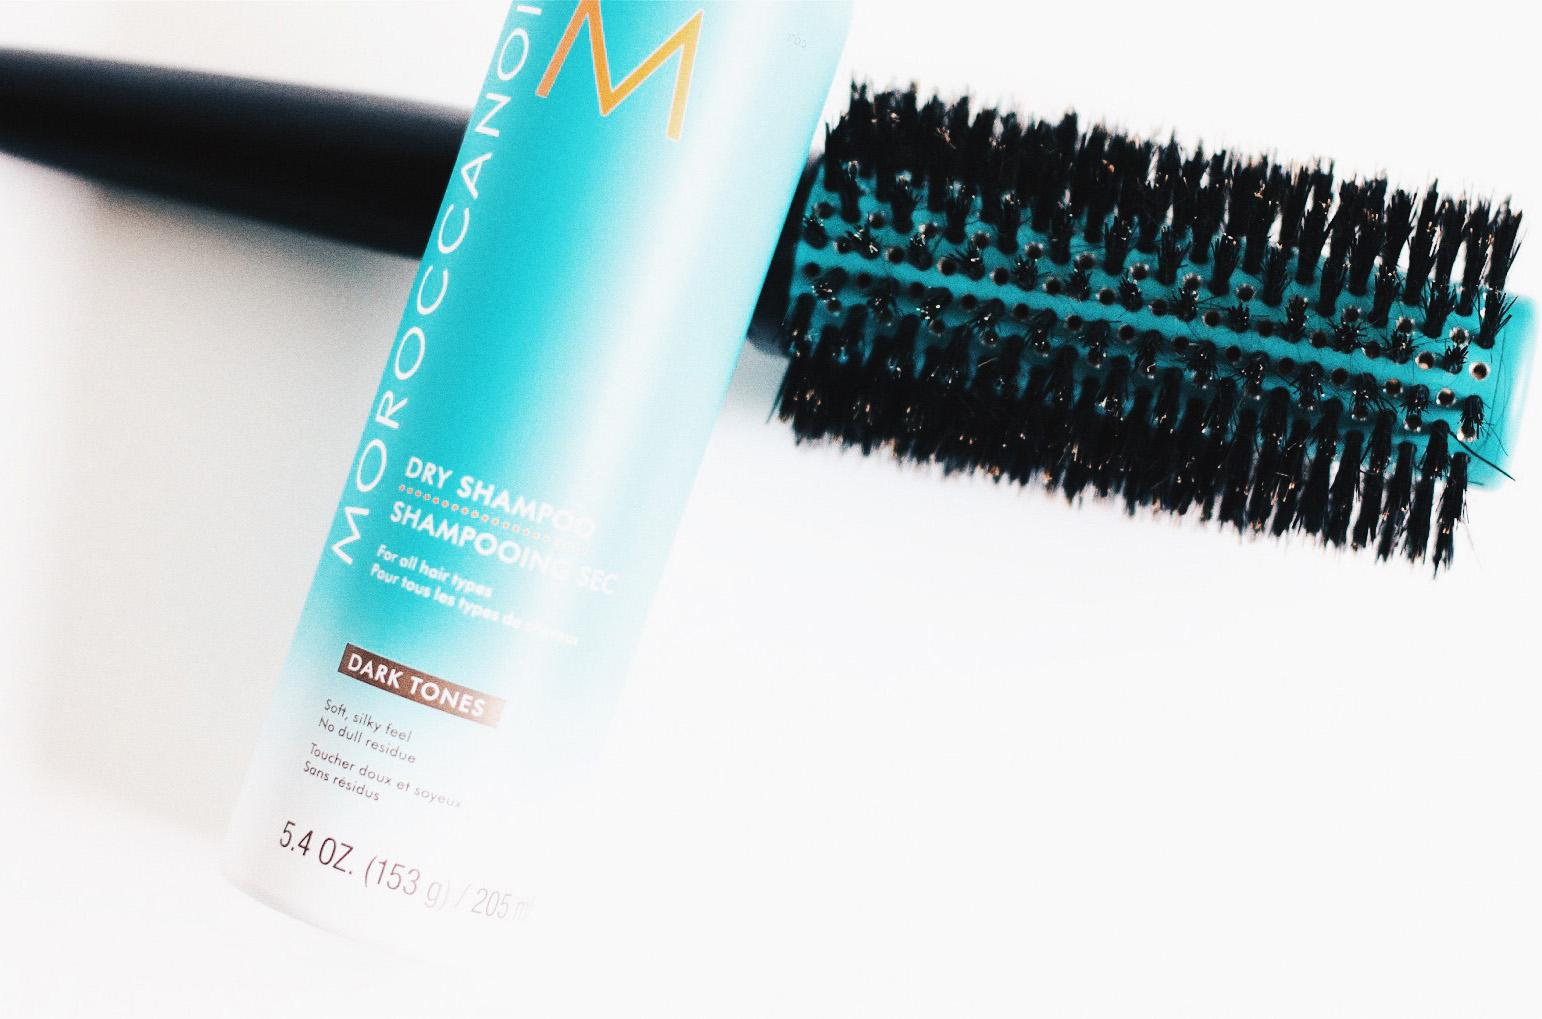 moroccanoil shampooing sec dark tones avis test